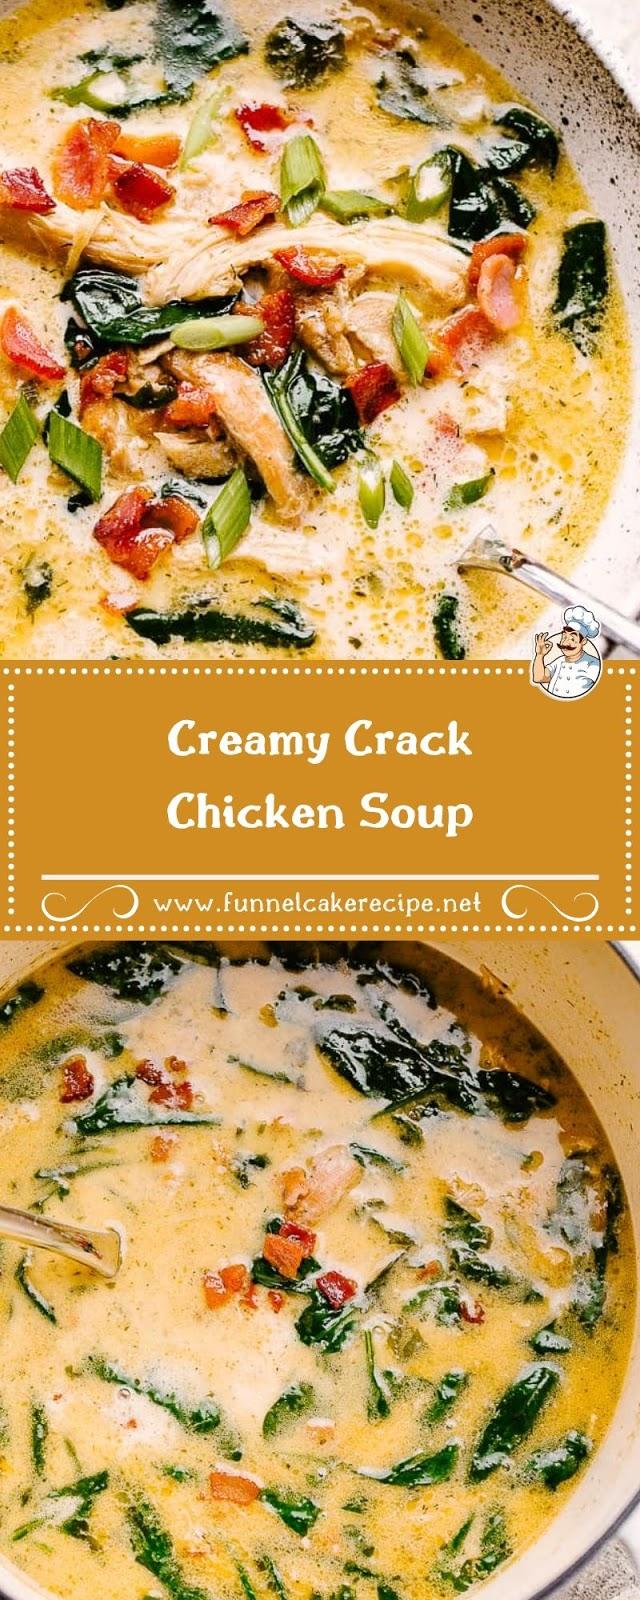 Creamy Crack Chicken Soup